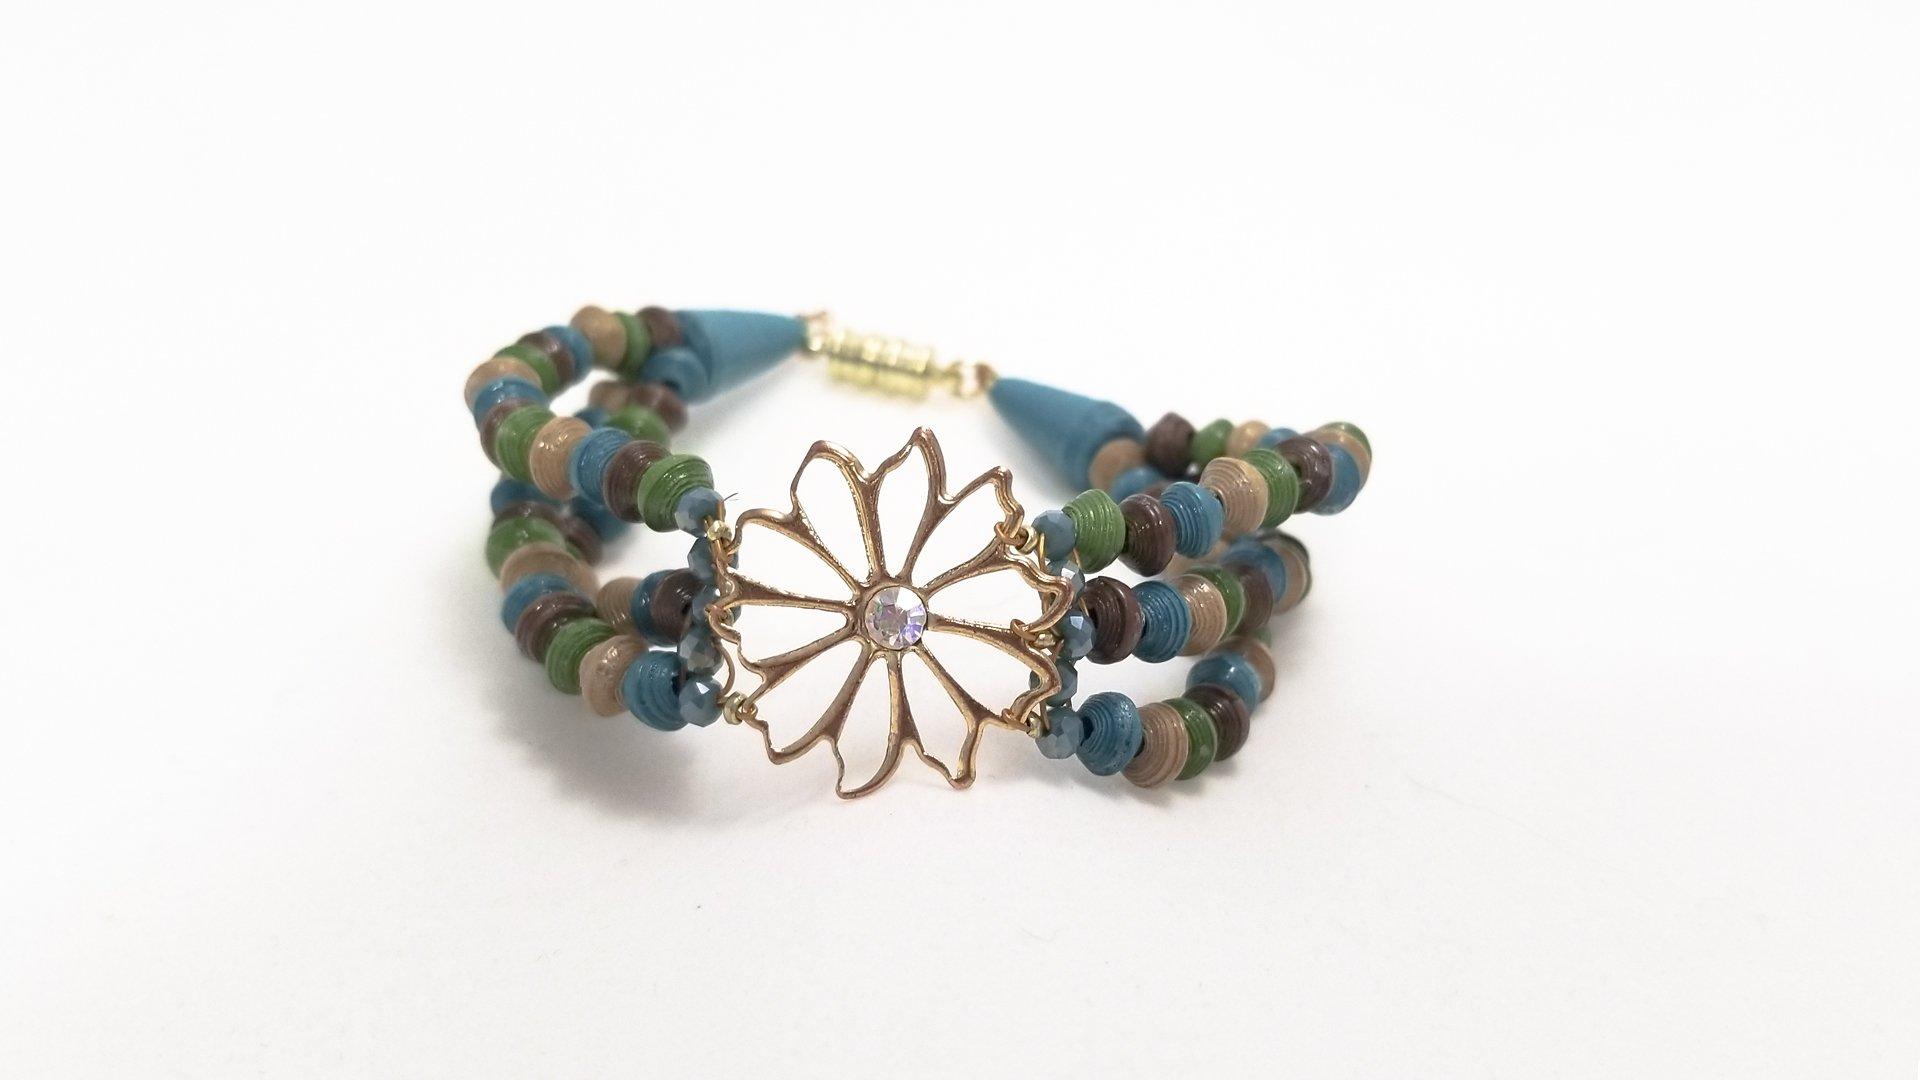 Multi-Strand Micro Paper Bead Bracelet Tutorial